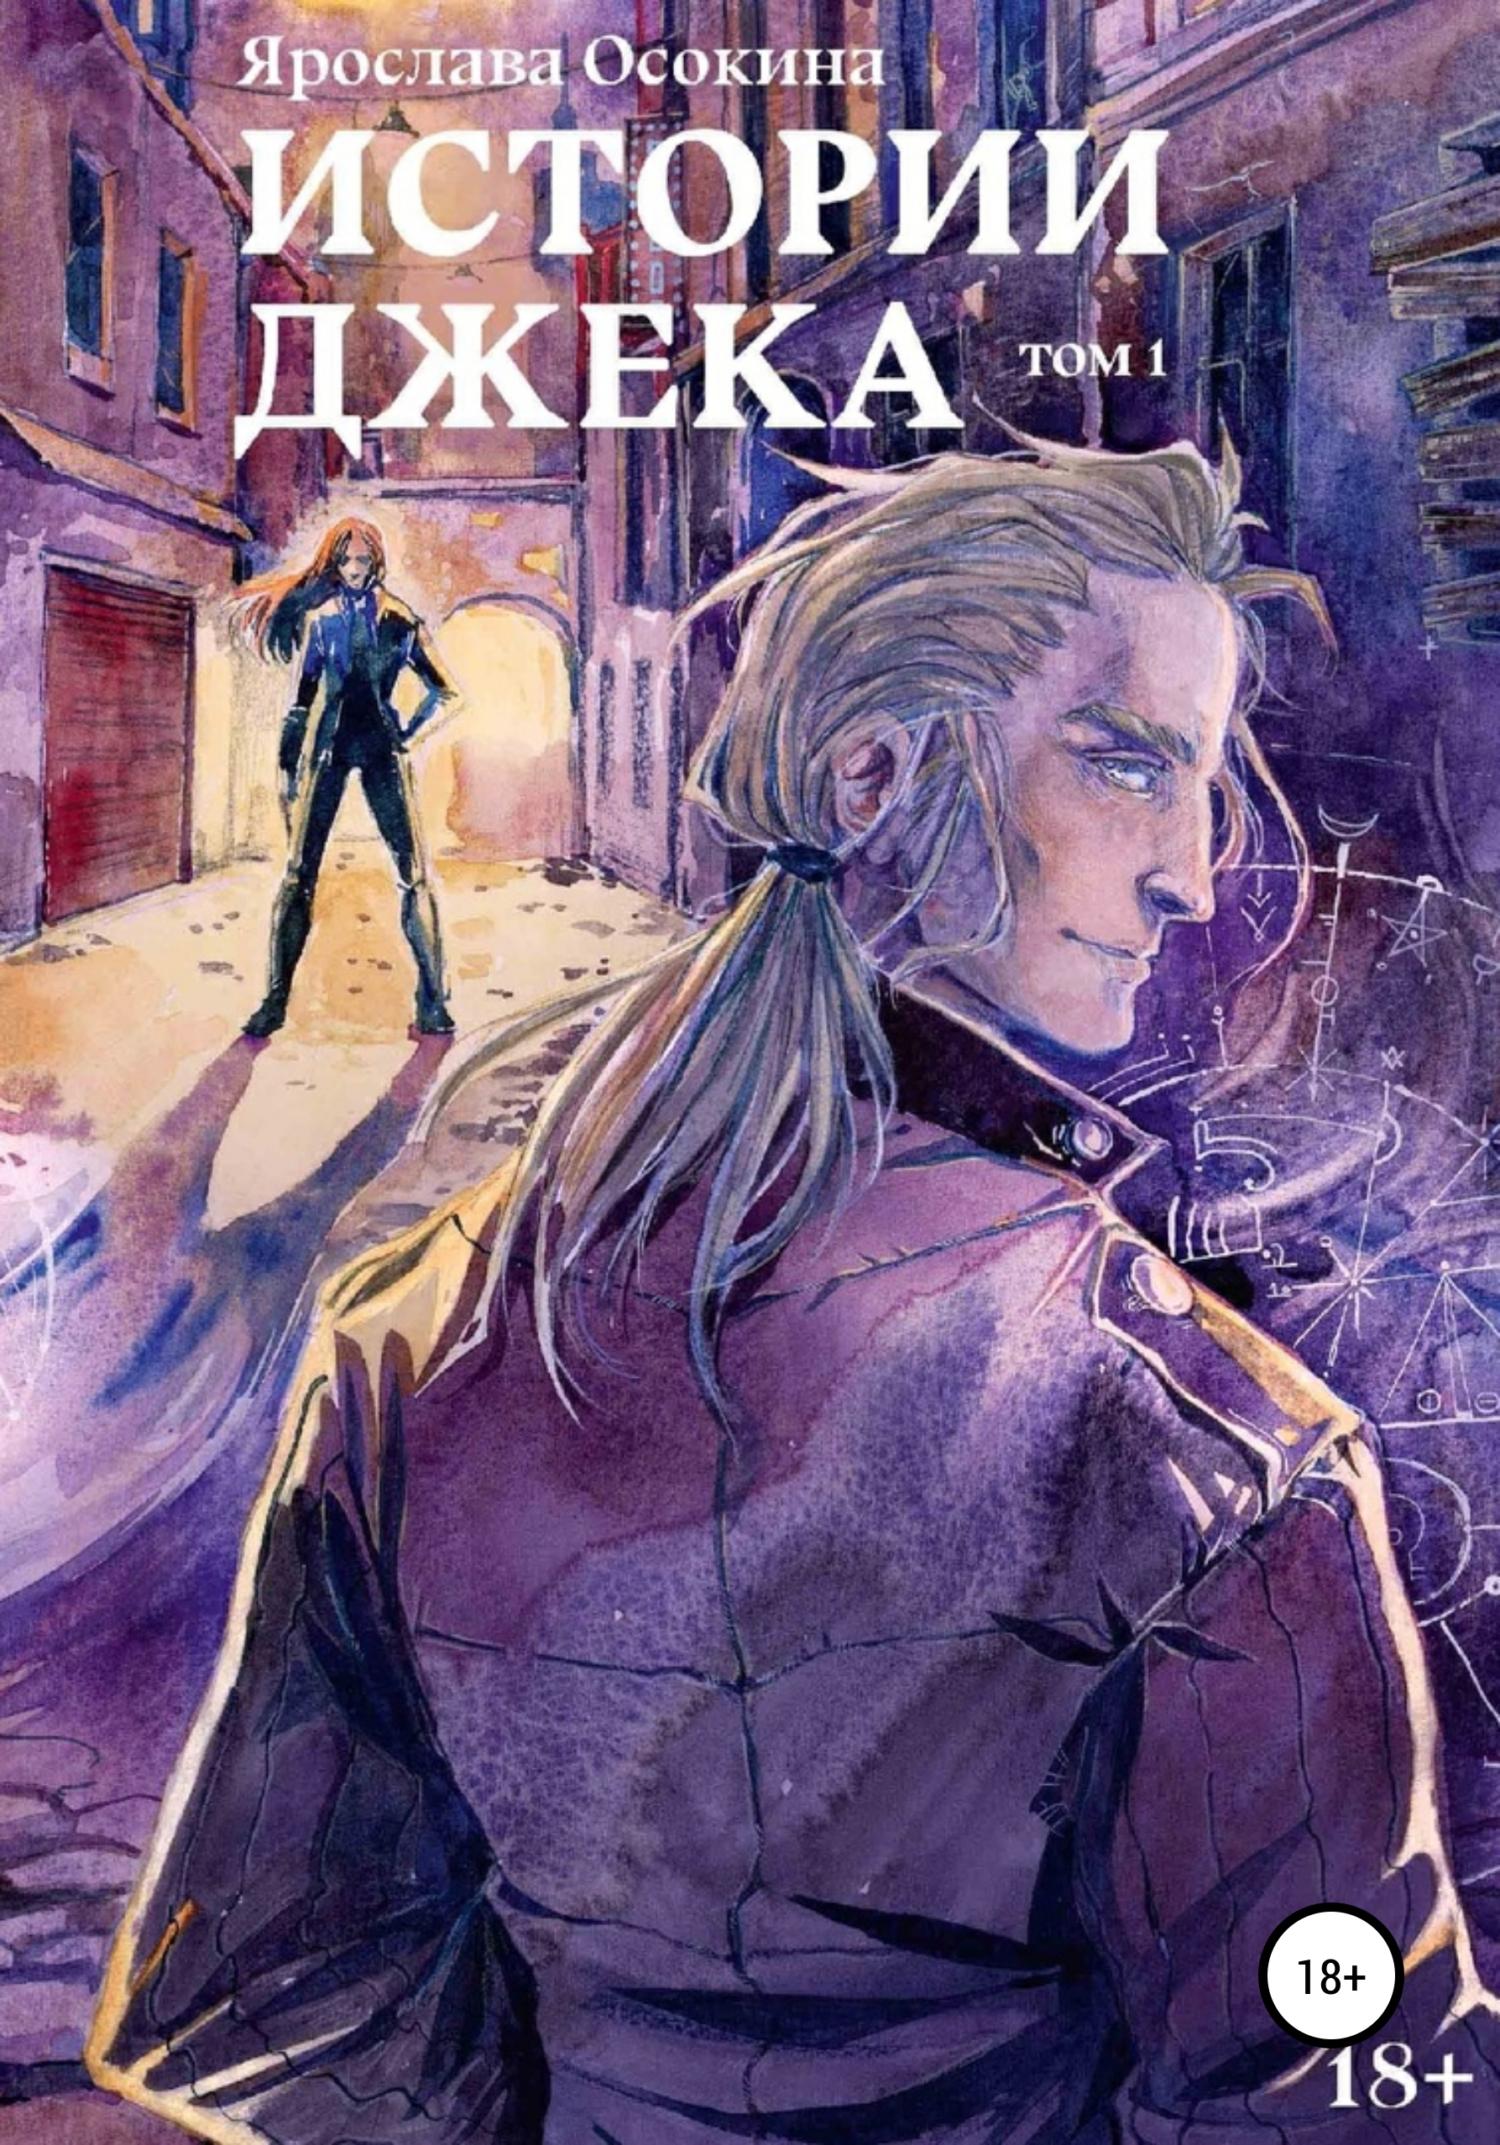 Ярослава Осокина Истории Джека. Части 1-2